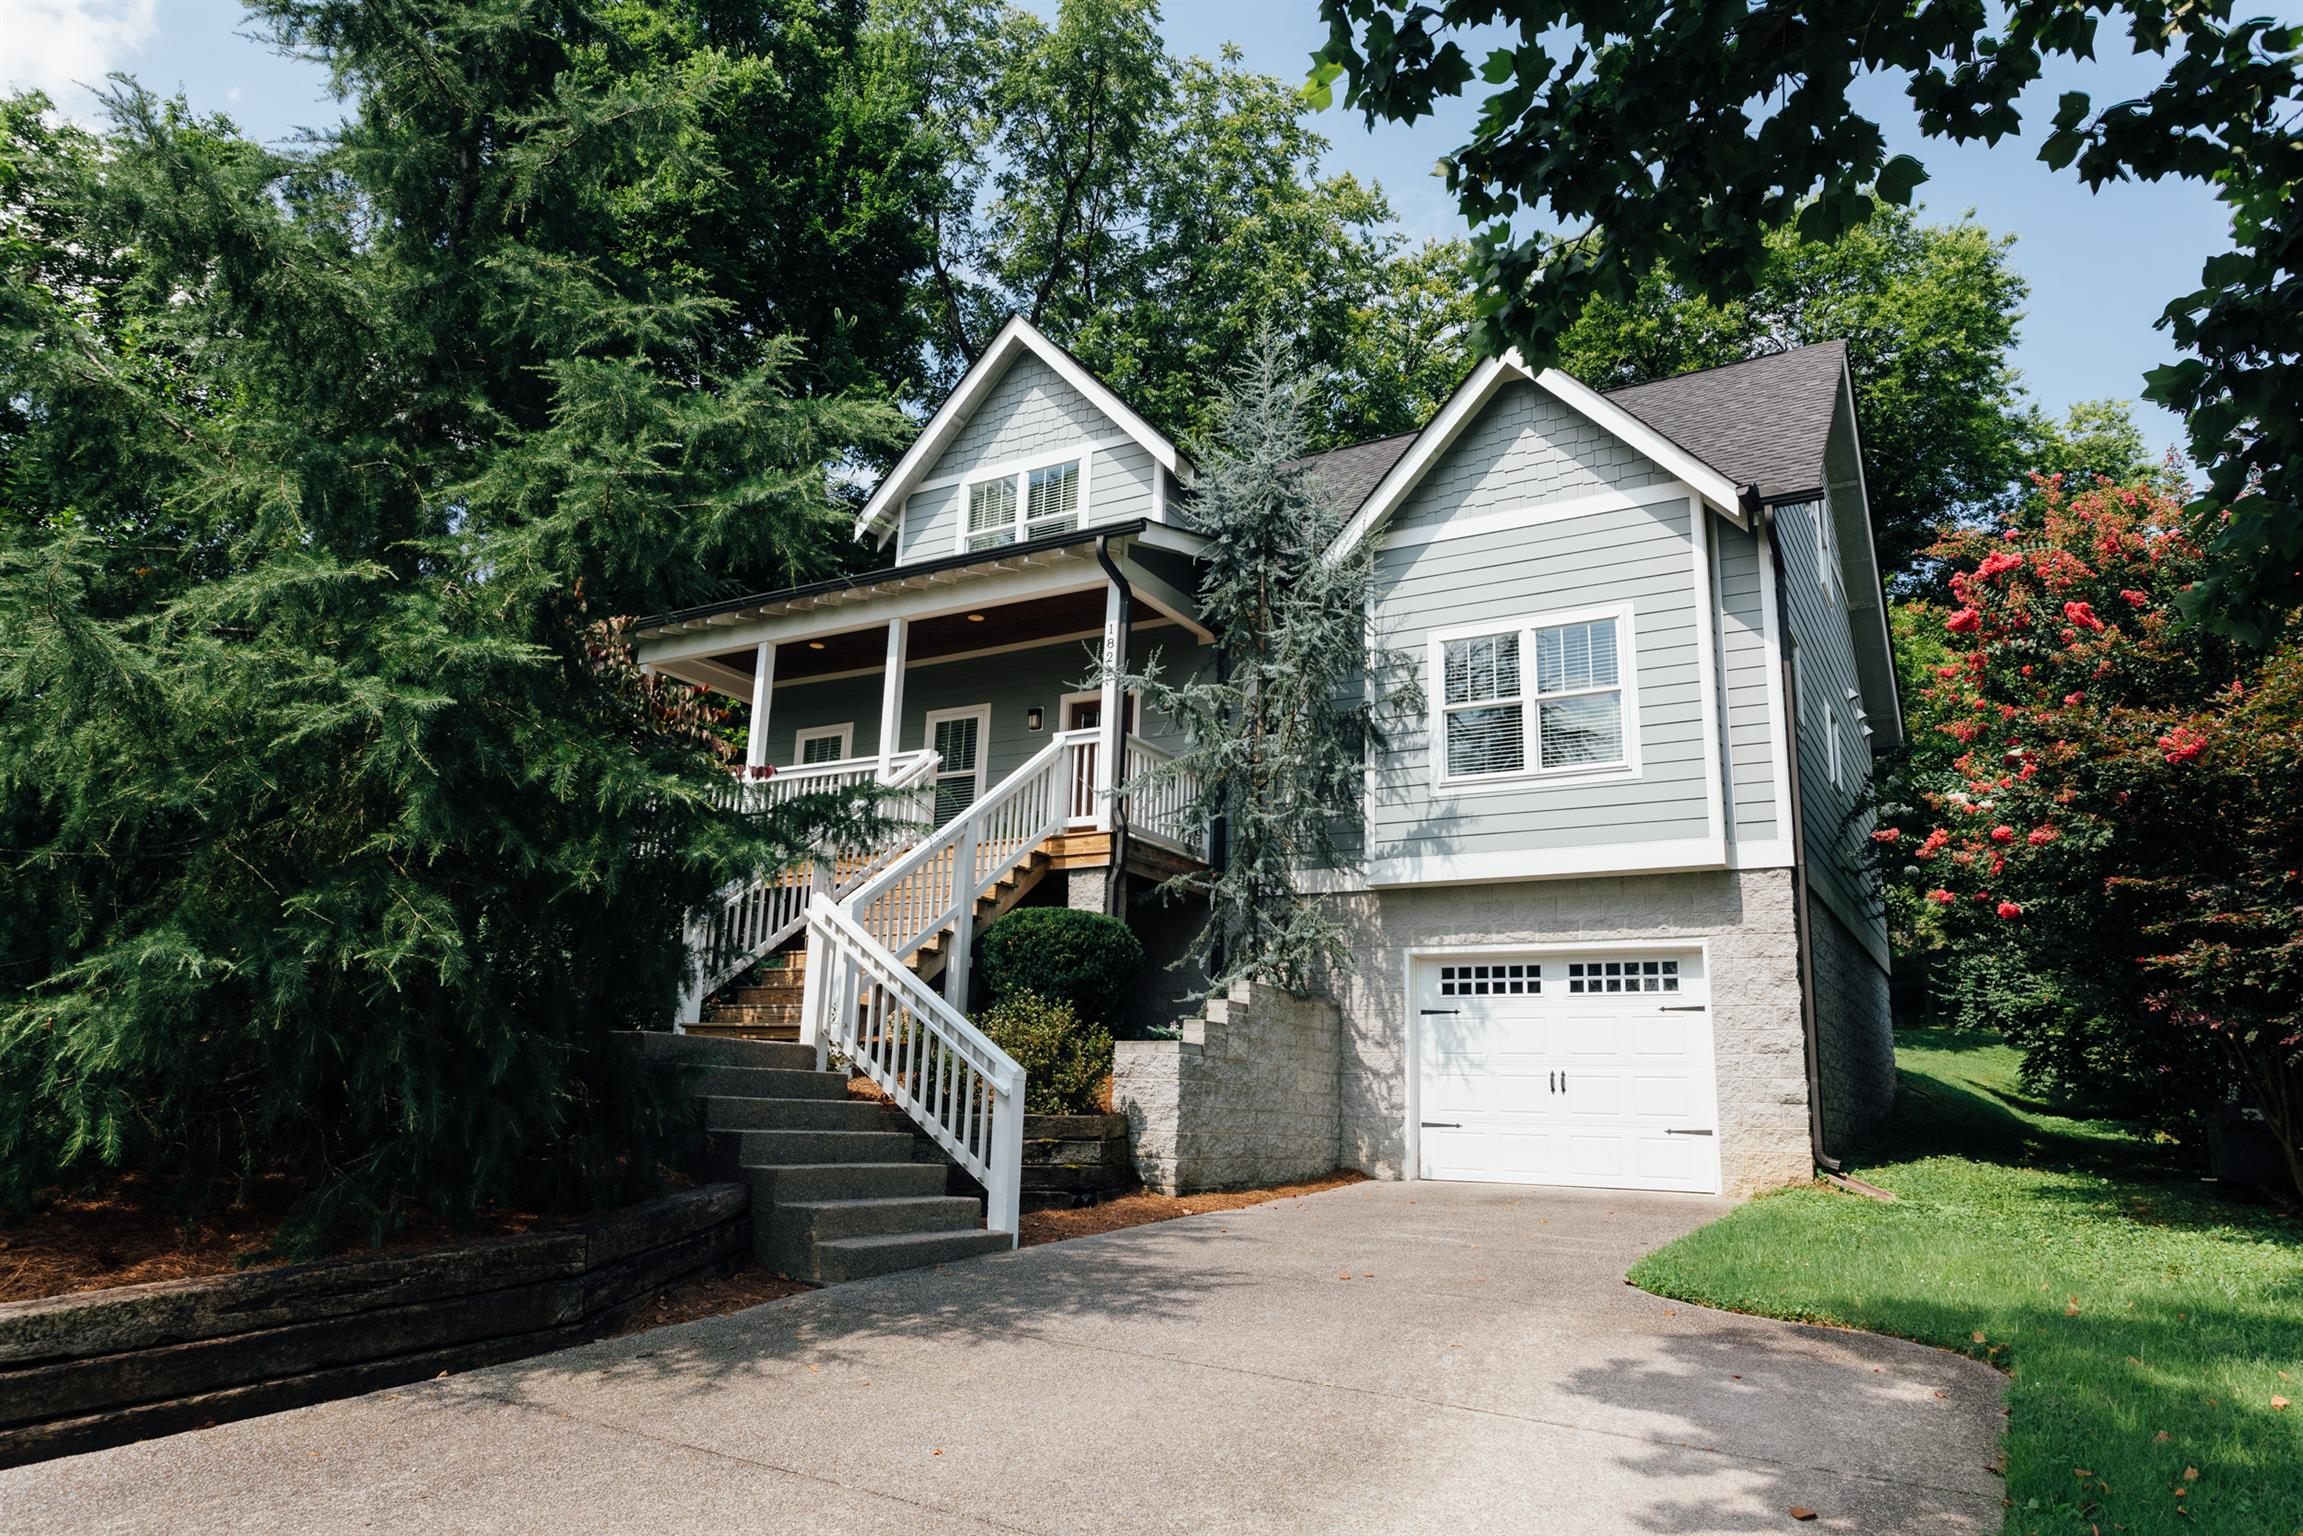 1822 Tammany Dr, Nashville, TN 37216 - Nashville, TN real estate listing